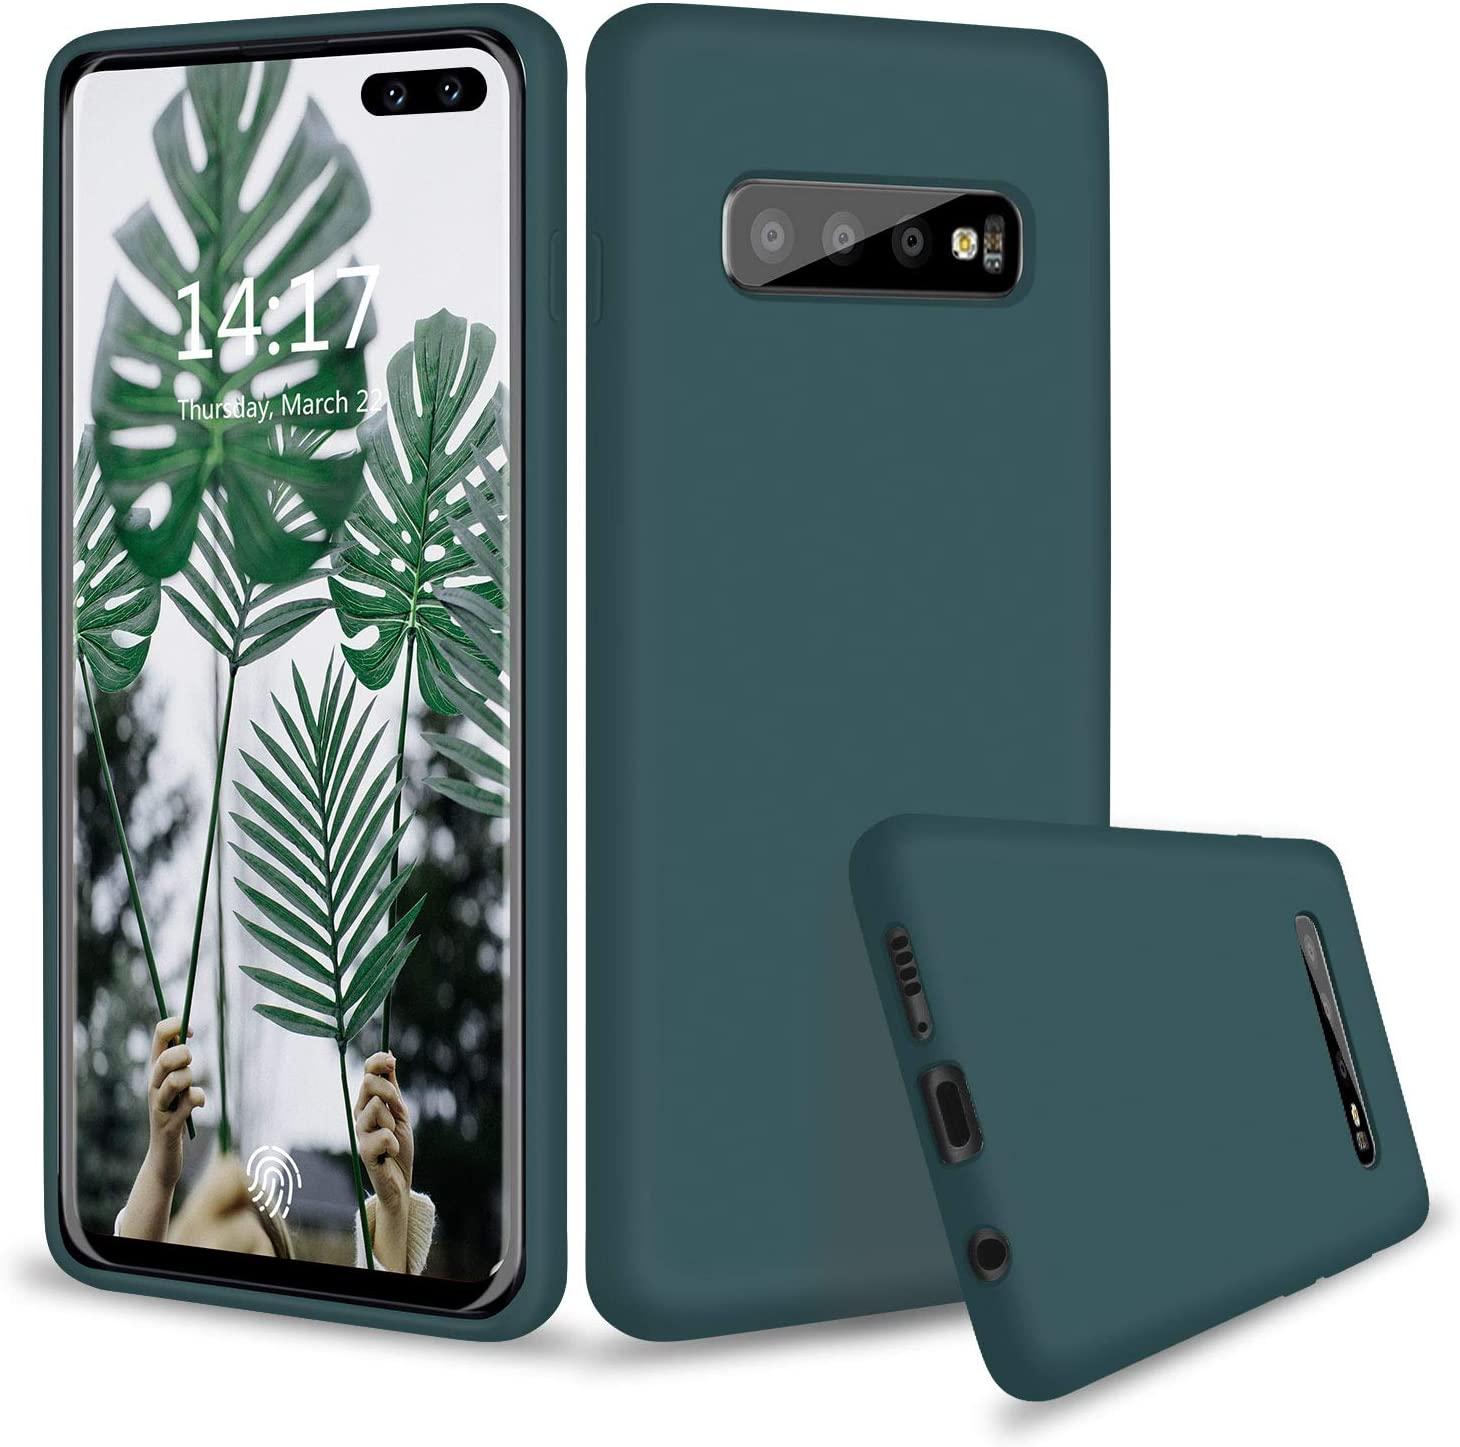 abitku Galaxy S10 Plus Case Silicone, Slim Liquid Silicone Gel Rubber Shockproof Soft Microfiber Cloth Lining Cushion Compatible with Galaxy S10 Plus 6.4 inch 2019 (Ocean Green)